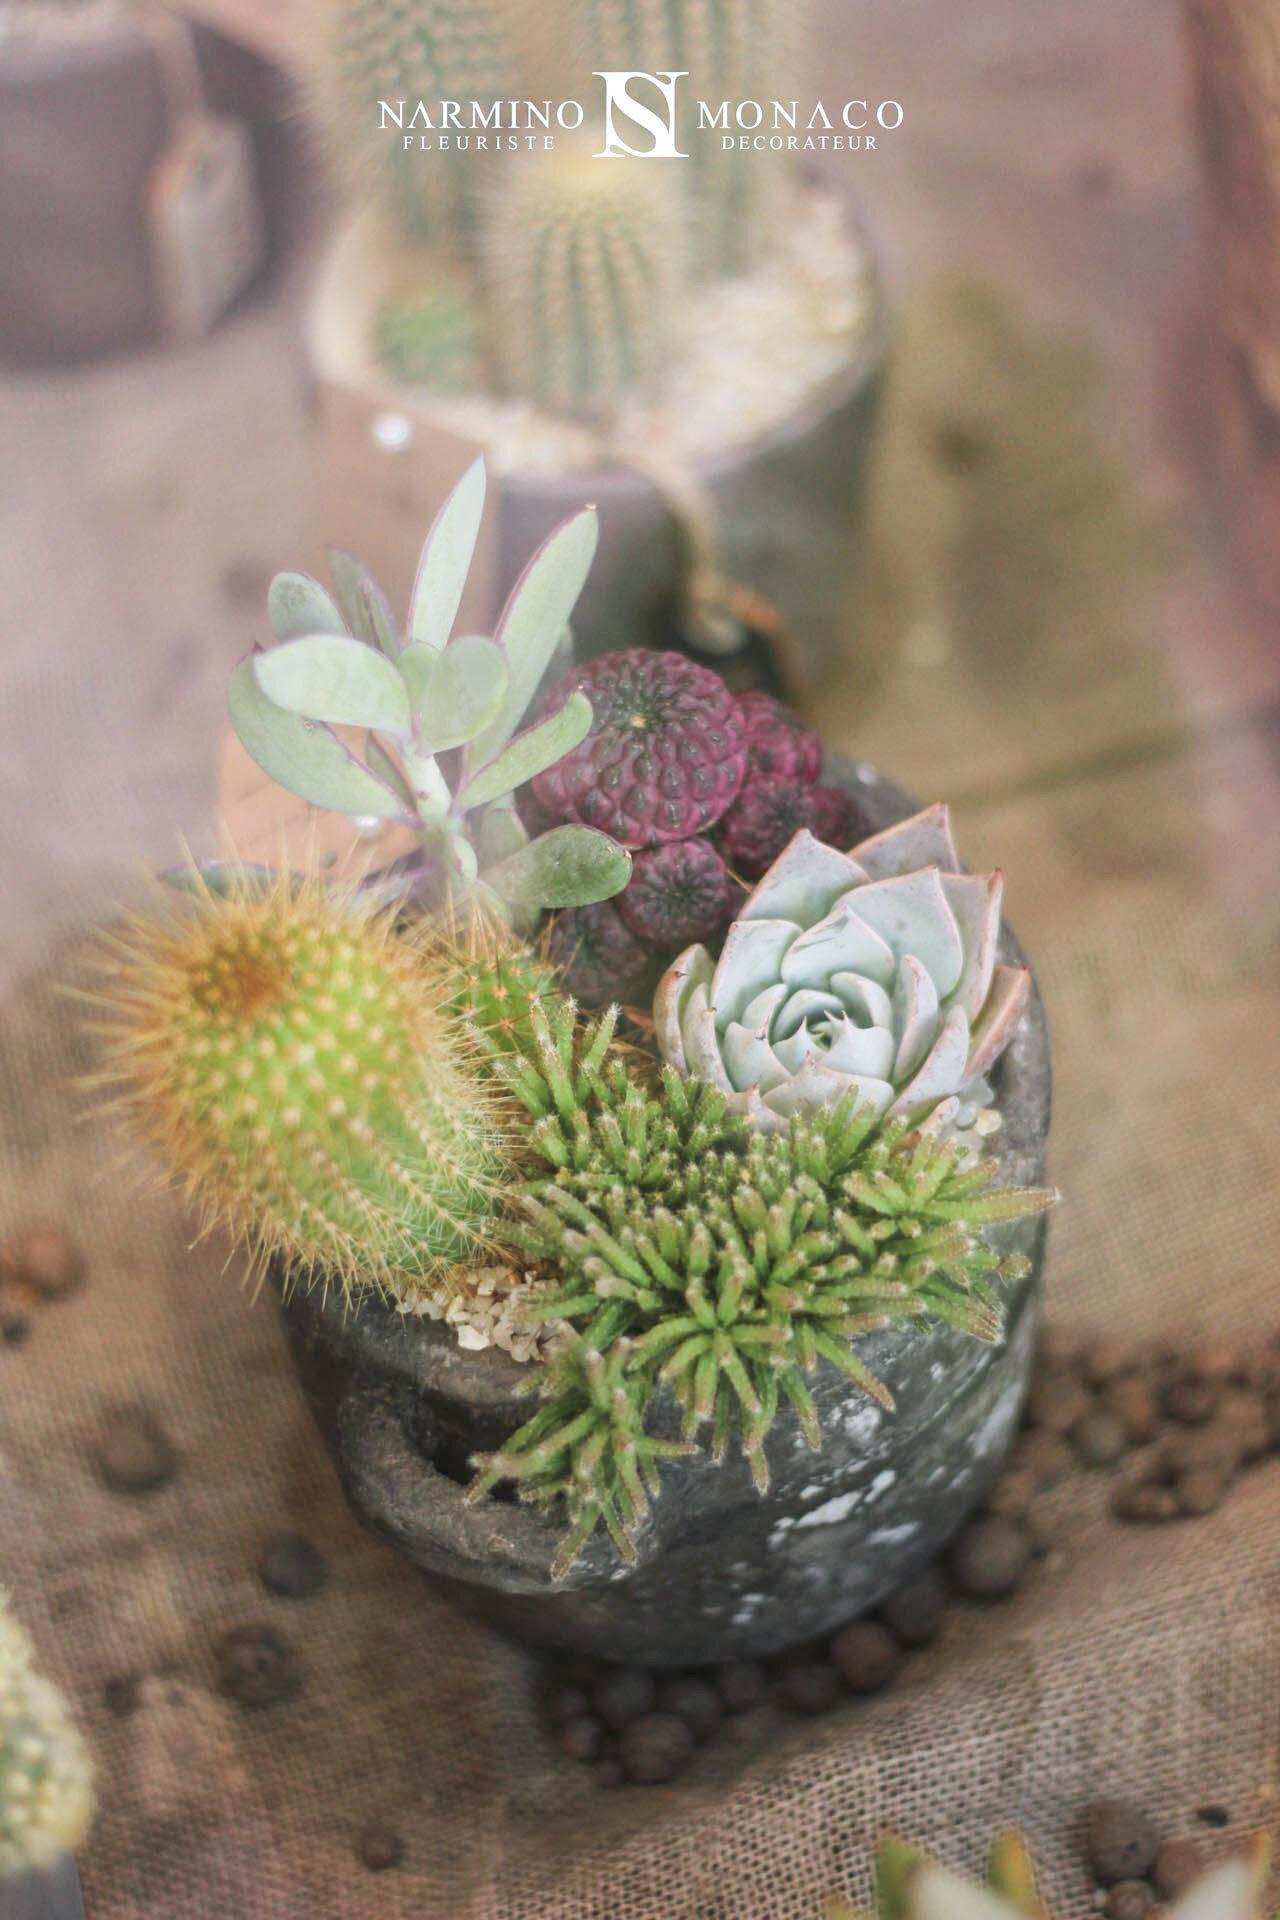 Cactus et plantes grasses Narmino Monaco